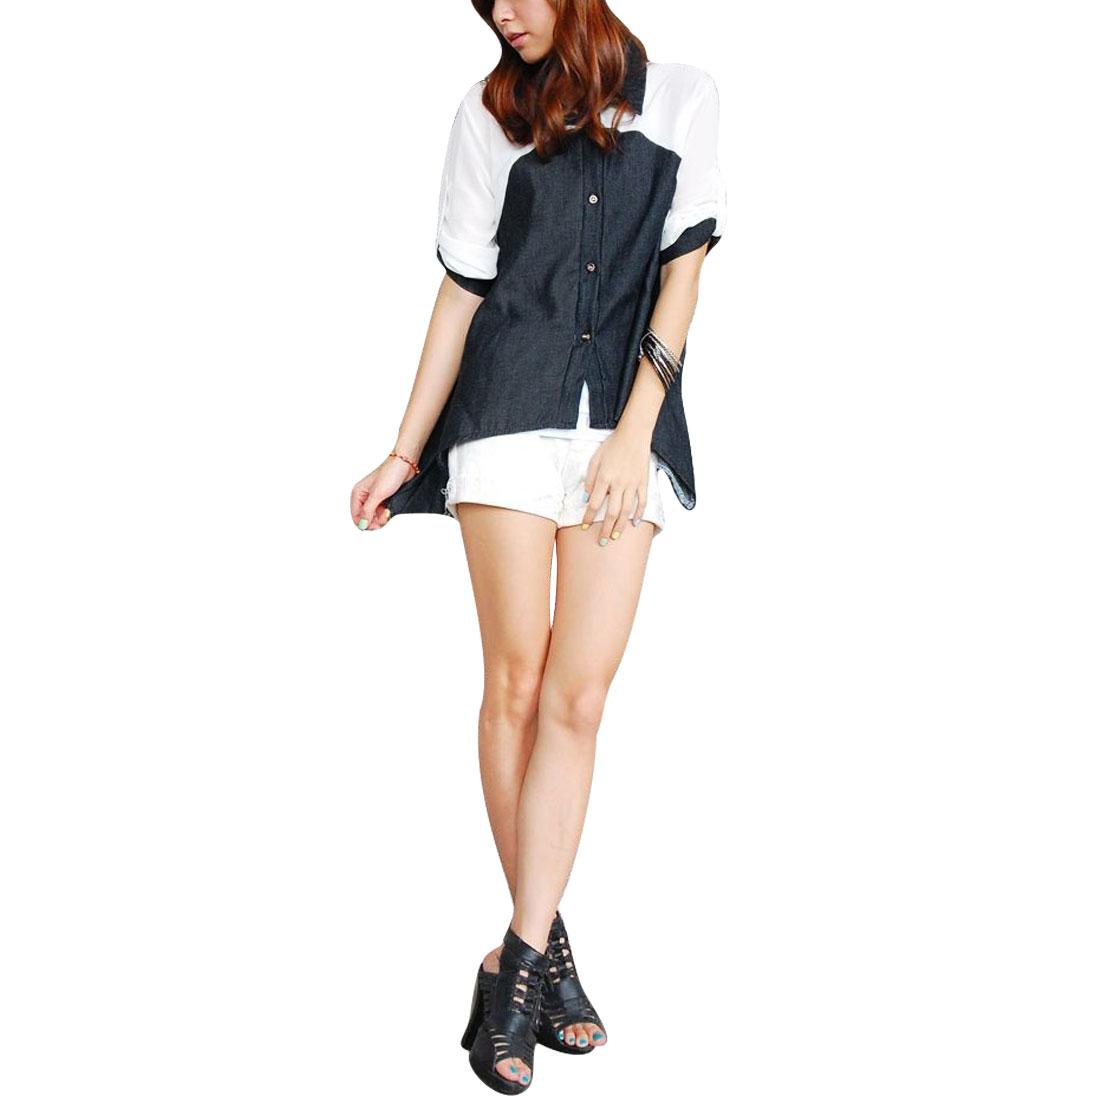 Women Roll Up Sleeve Button-front Point Collar Shirt Dark Grey Xs